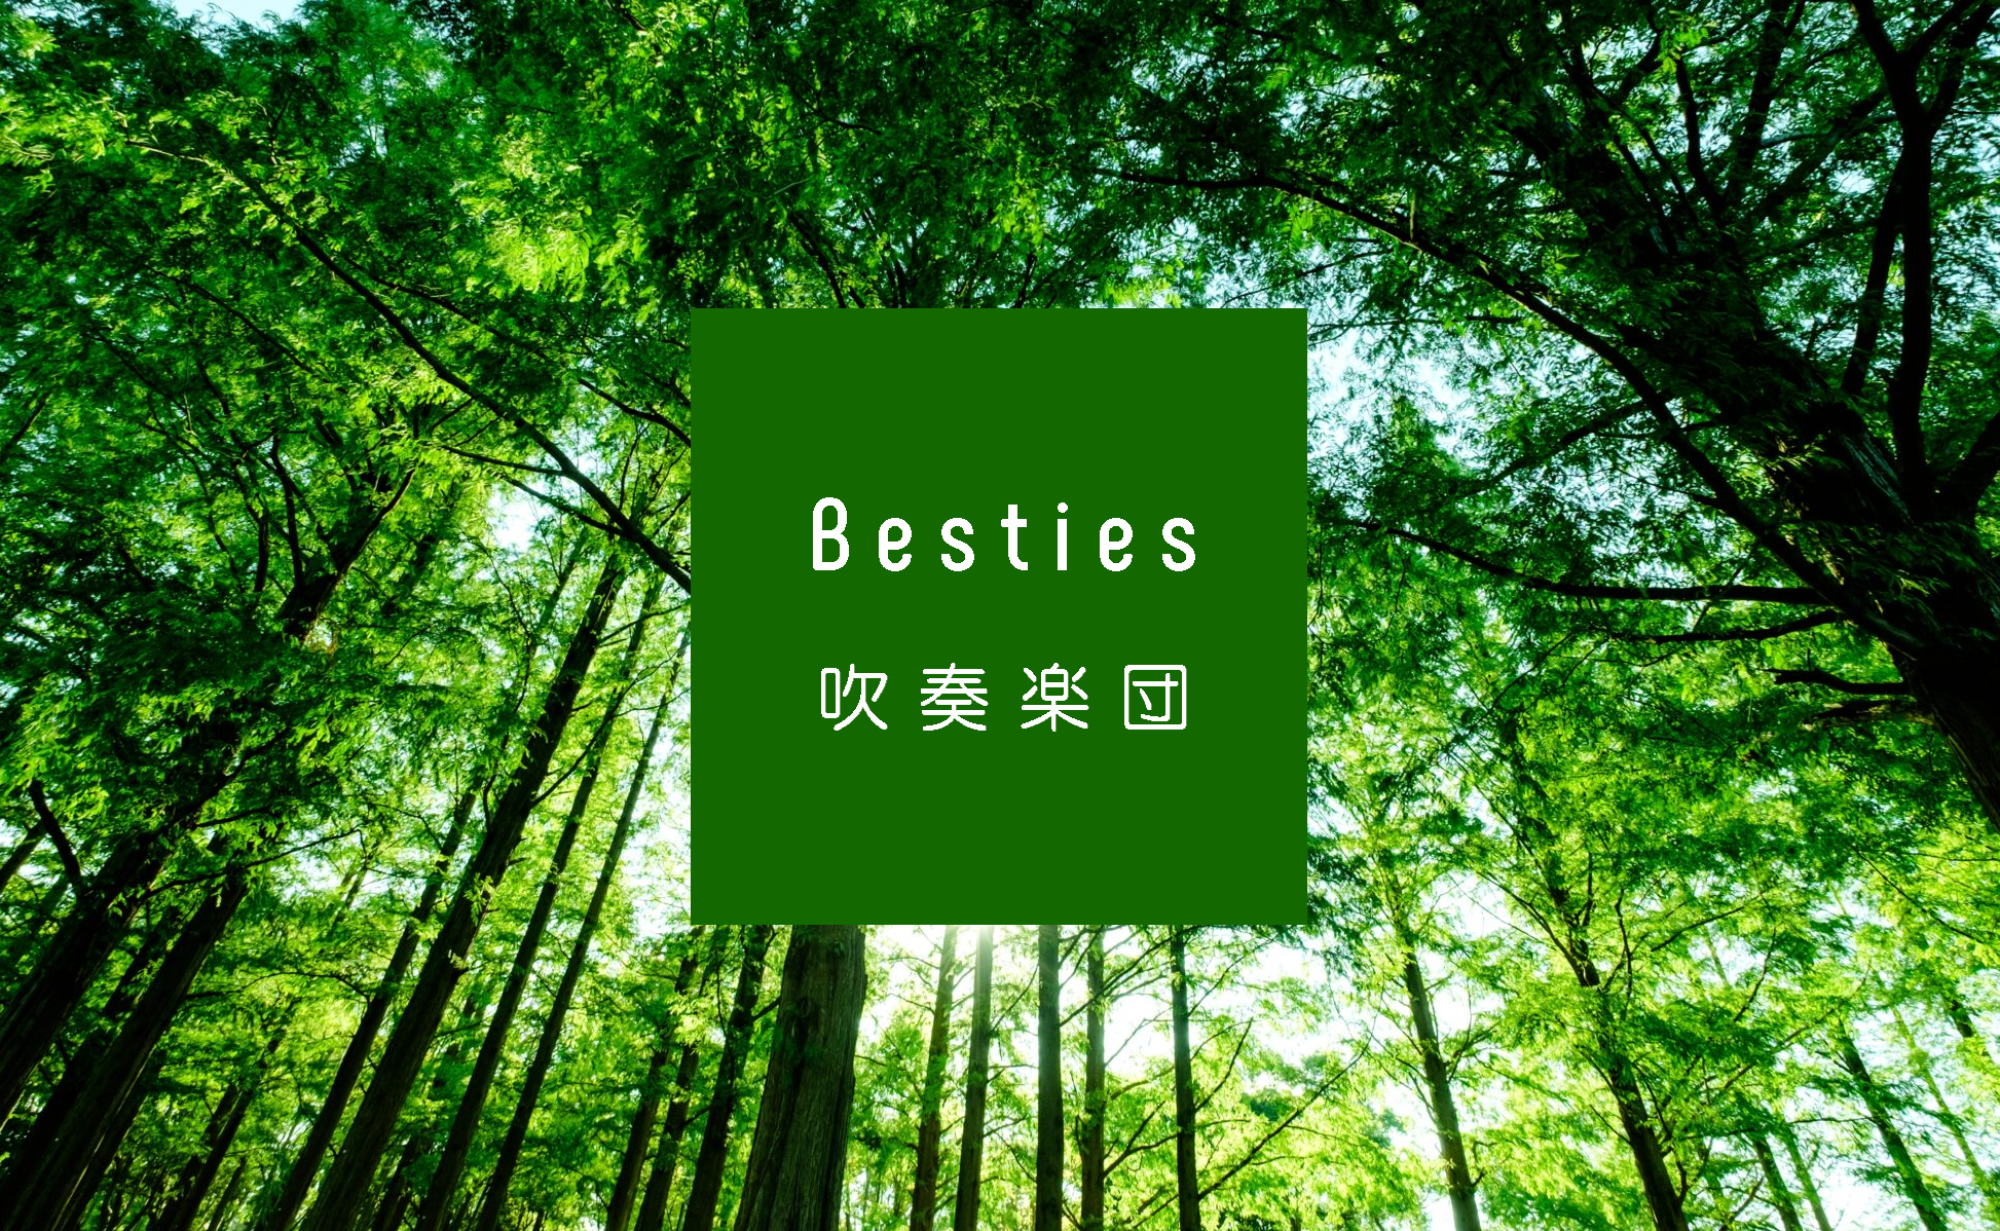 Besties吹奏楽団のブログ